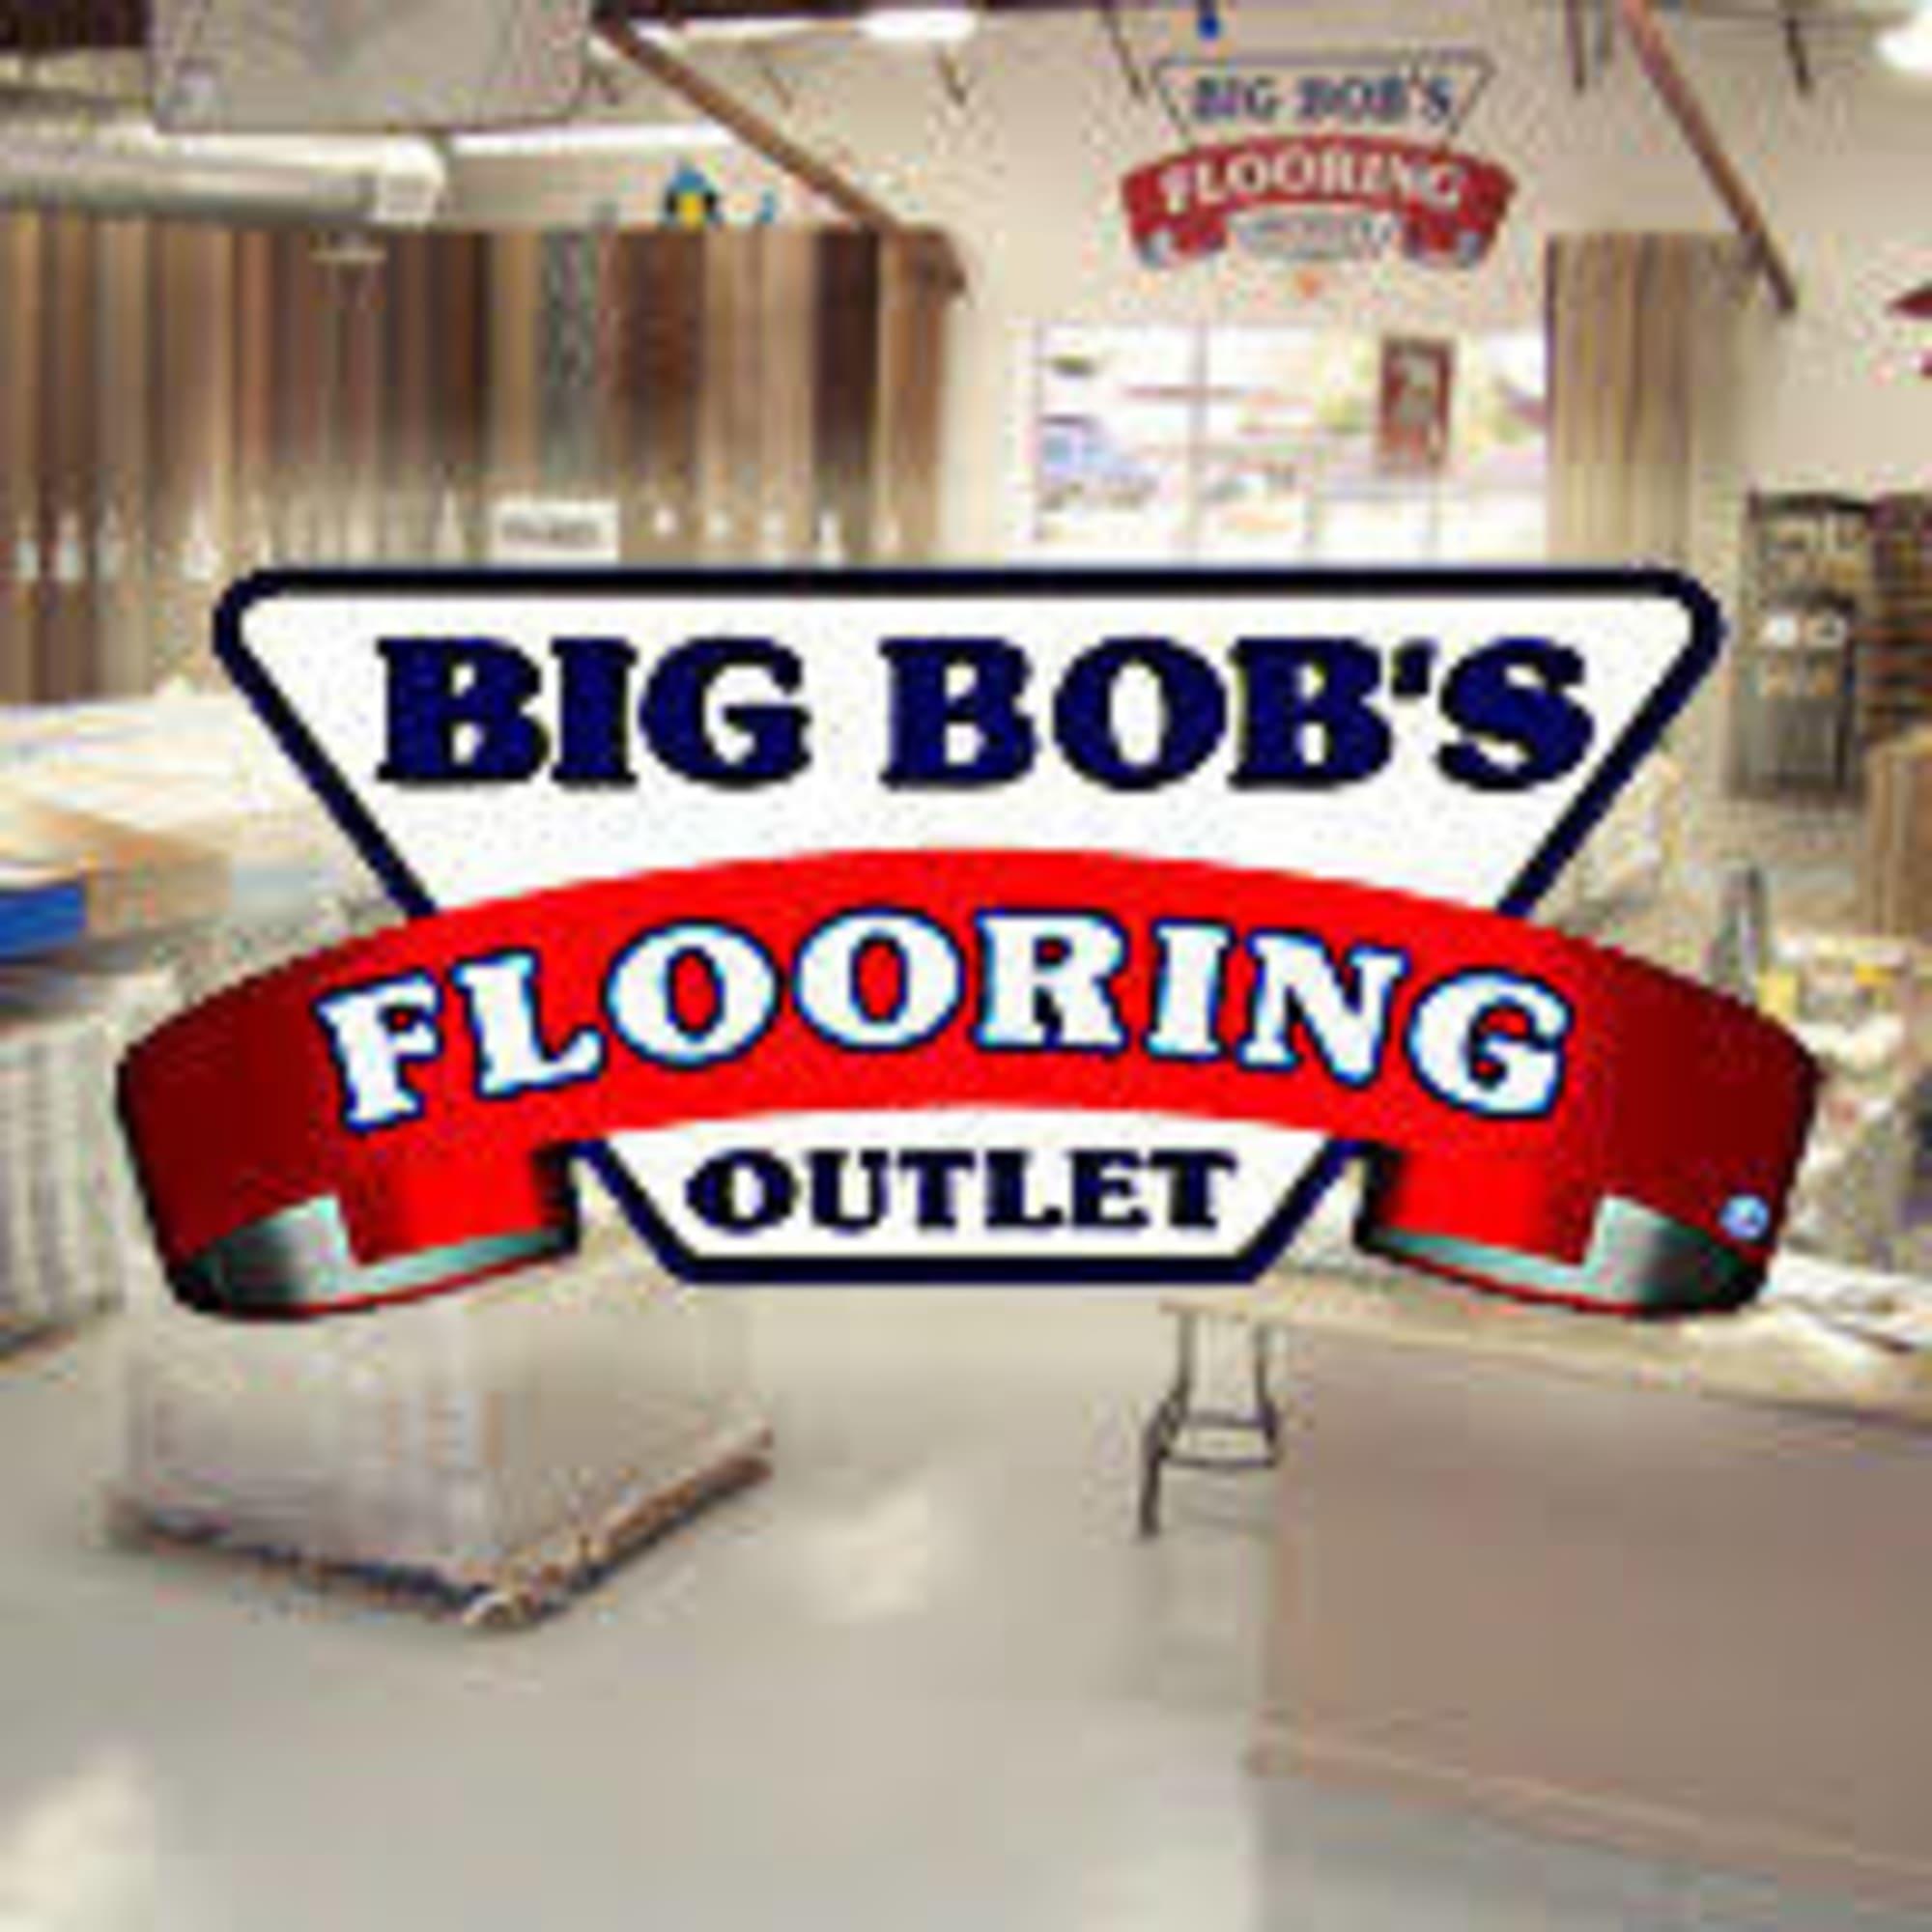 Big Bob's Flooring Outlet - 1821 S Arizona Ave Yuma, AZ 85365